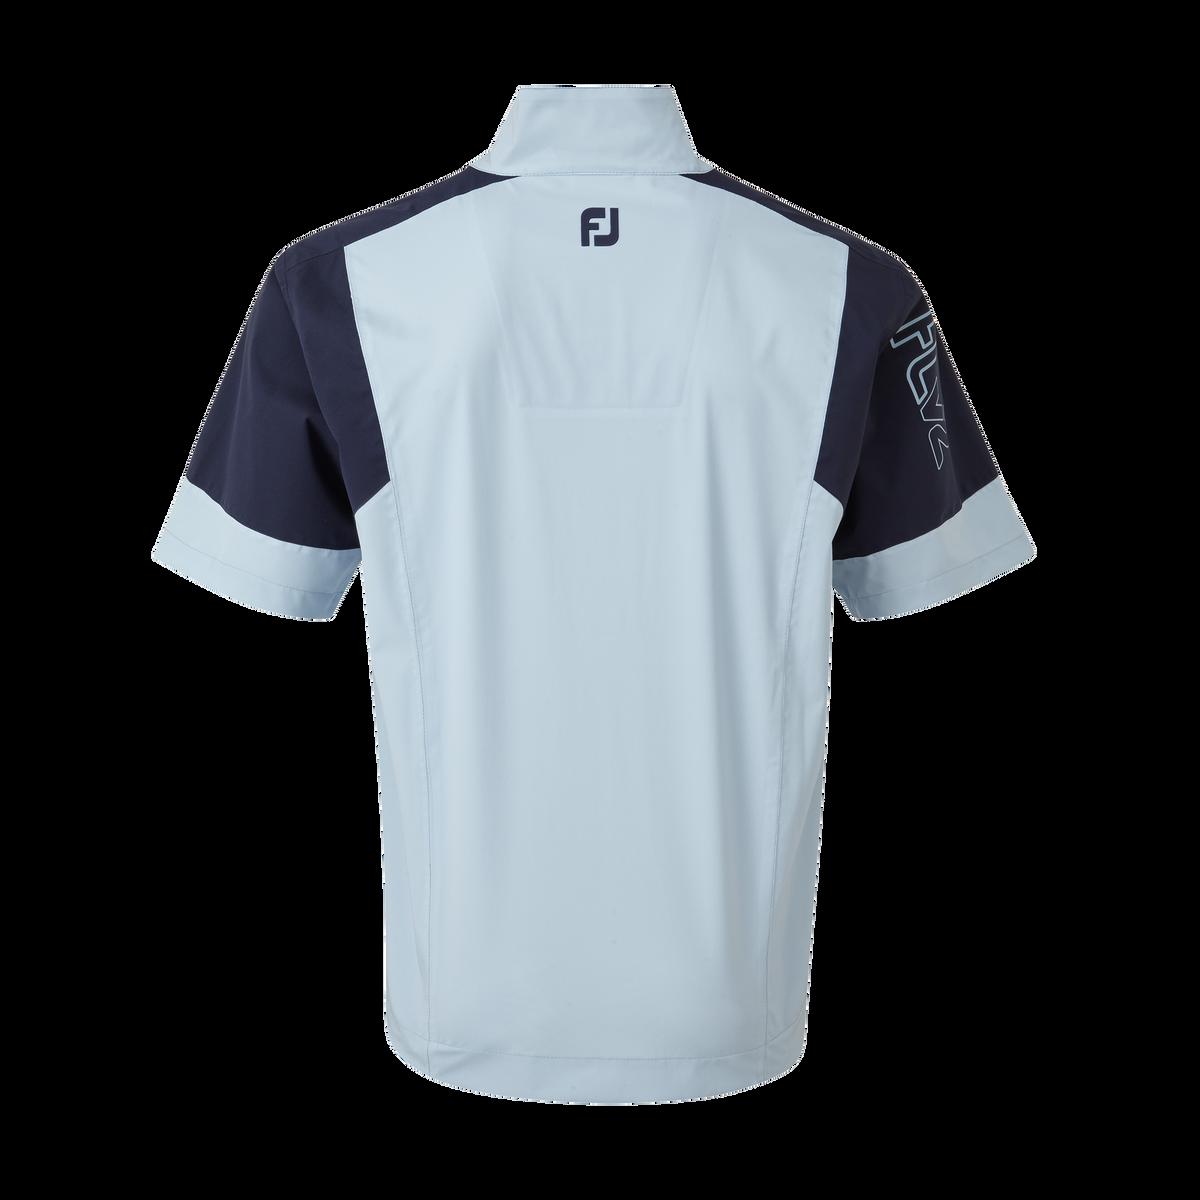 FJ HyrdoLite V2 Kurzarm-Regenhemd